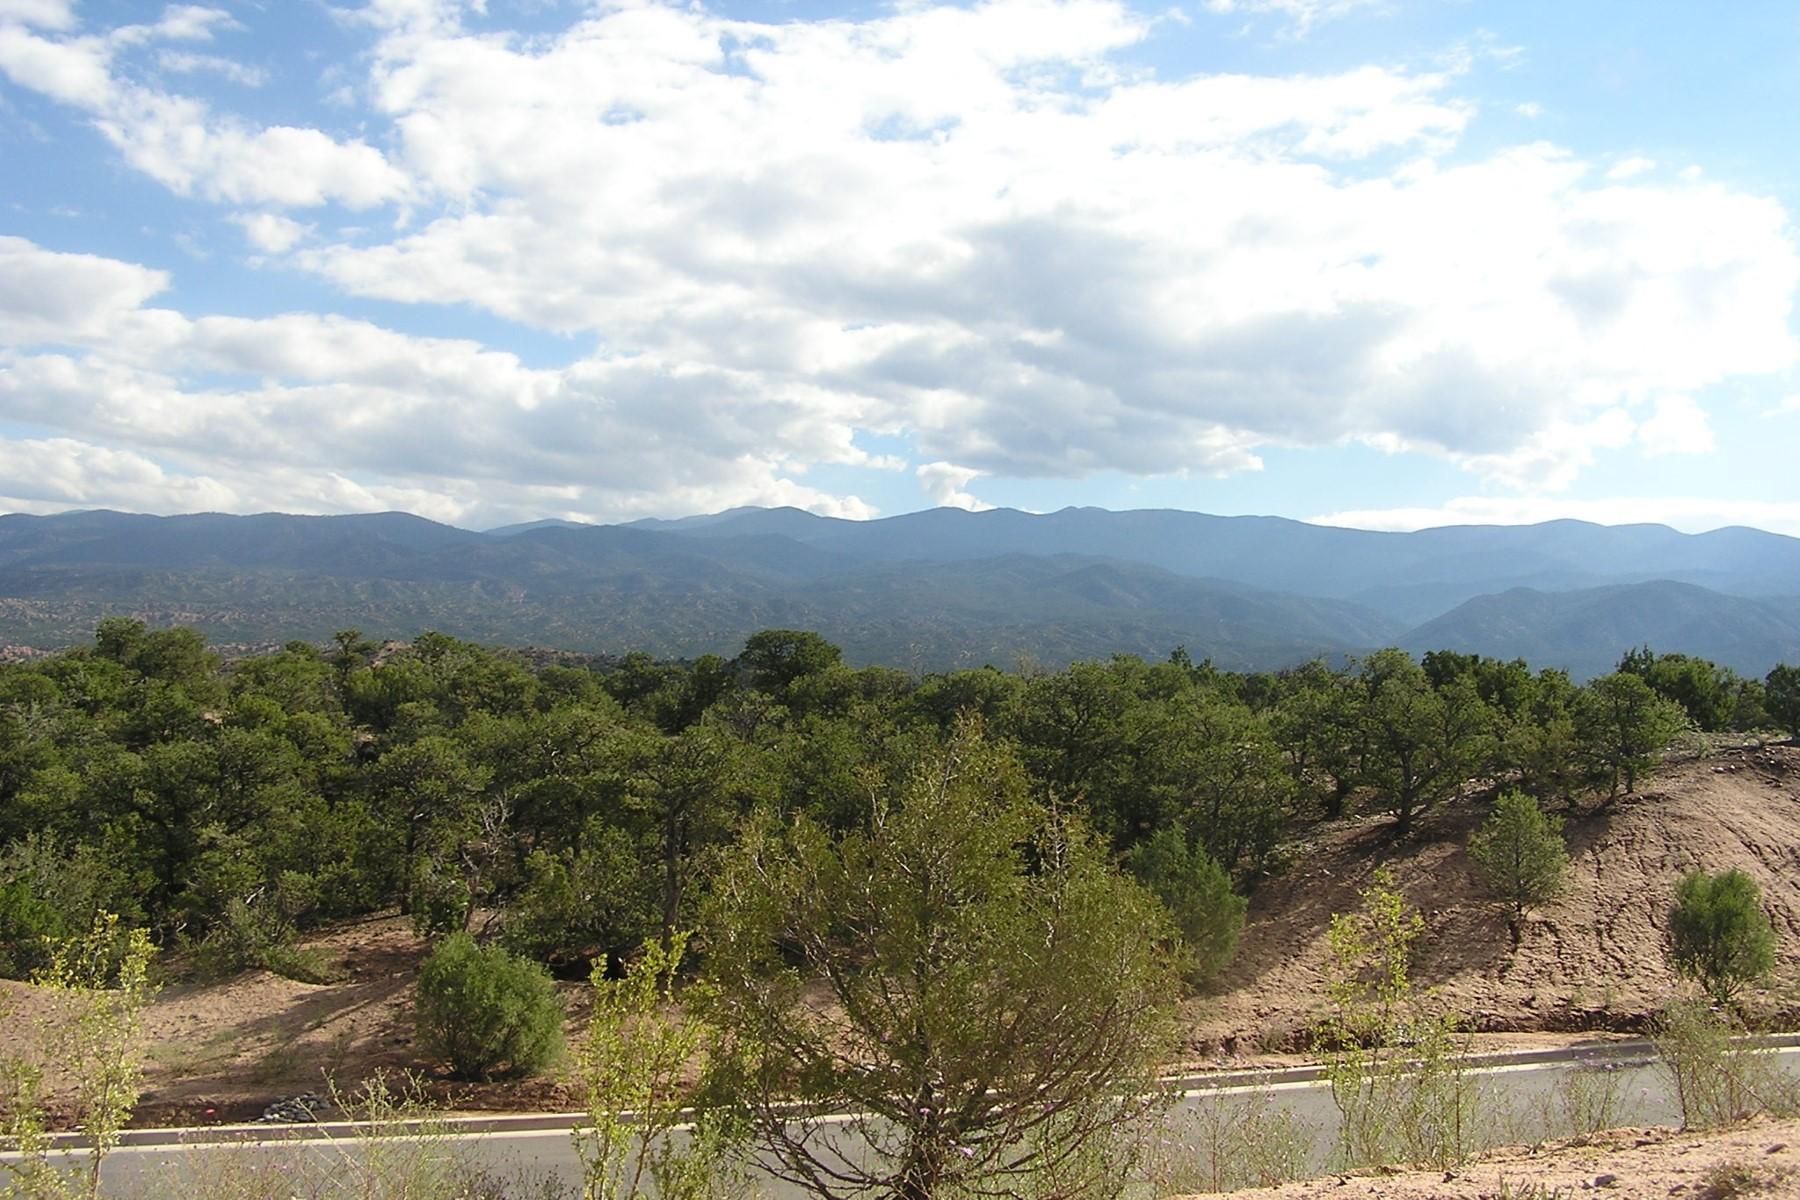 Land for Sale at 129 Valle Sereno, Lot 168 Monte Sereno, Santa Fe, New Mexico 87506 United States